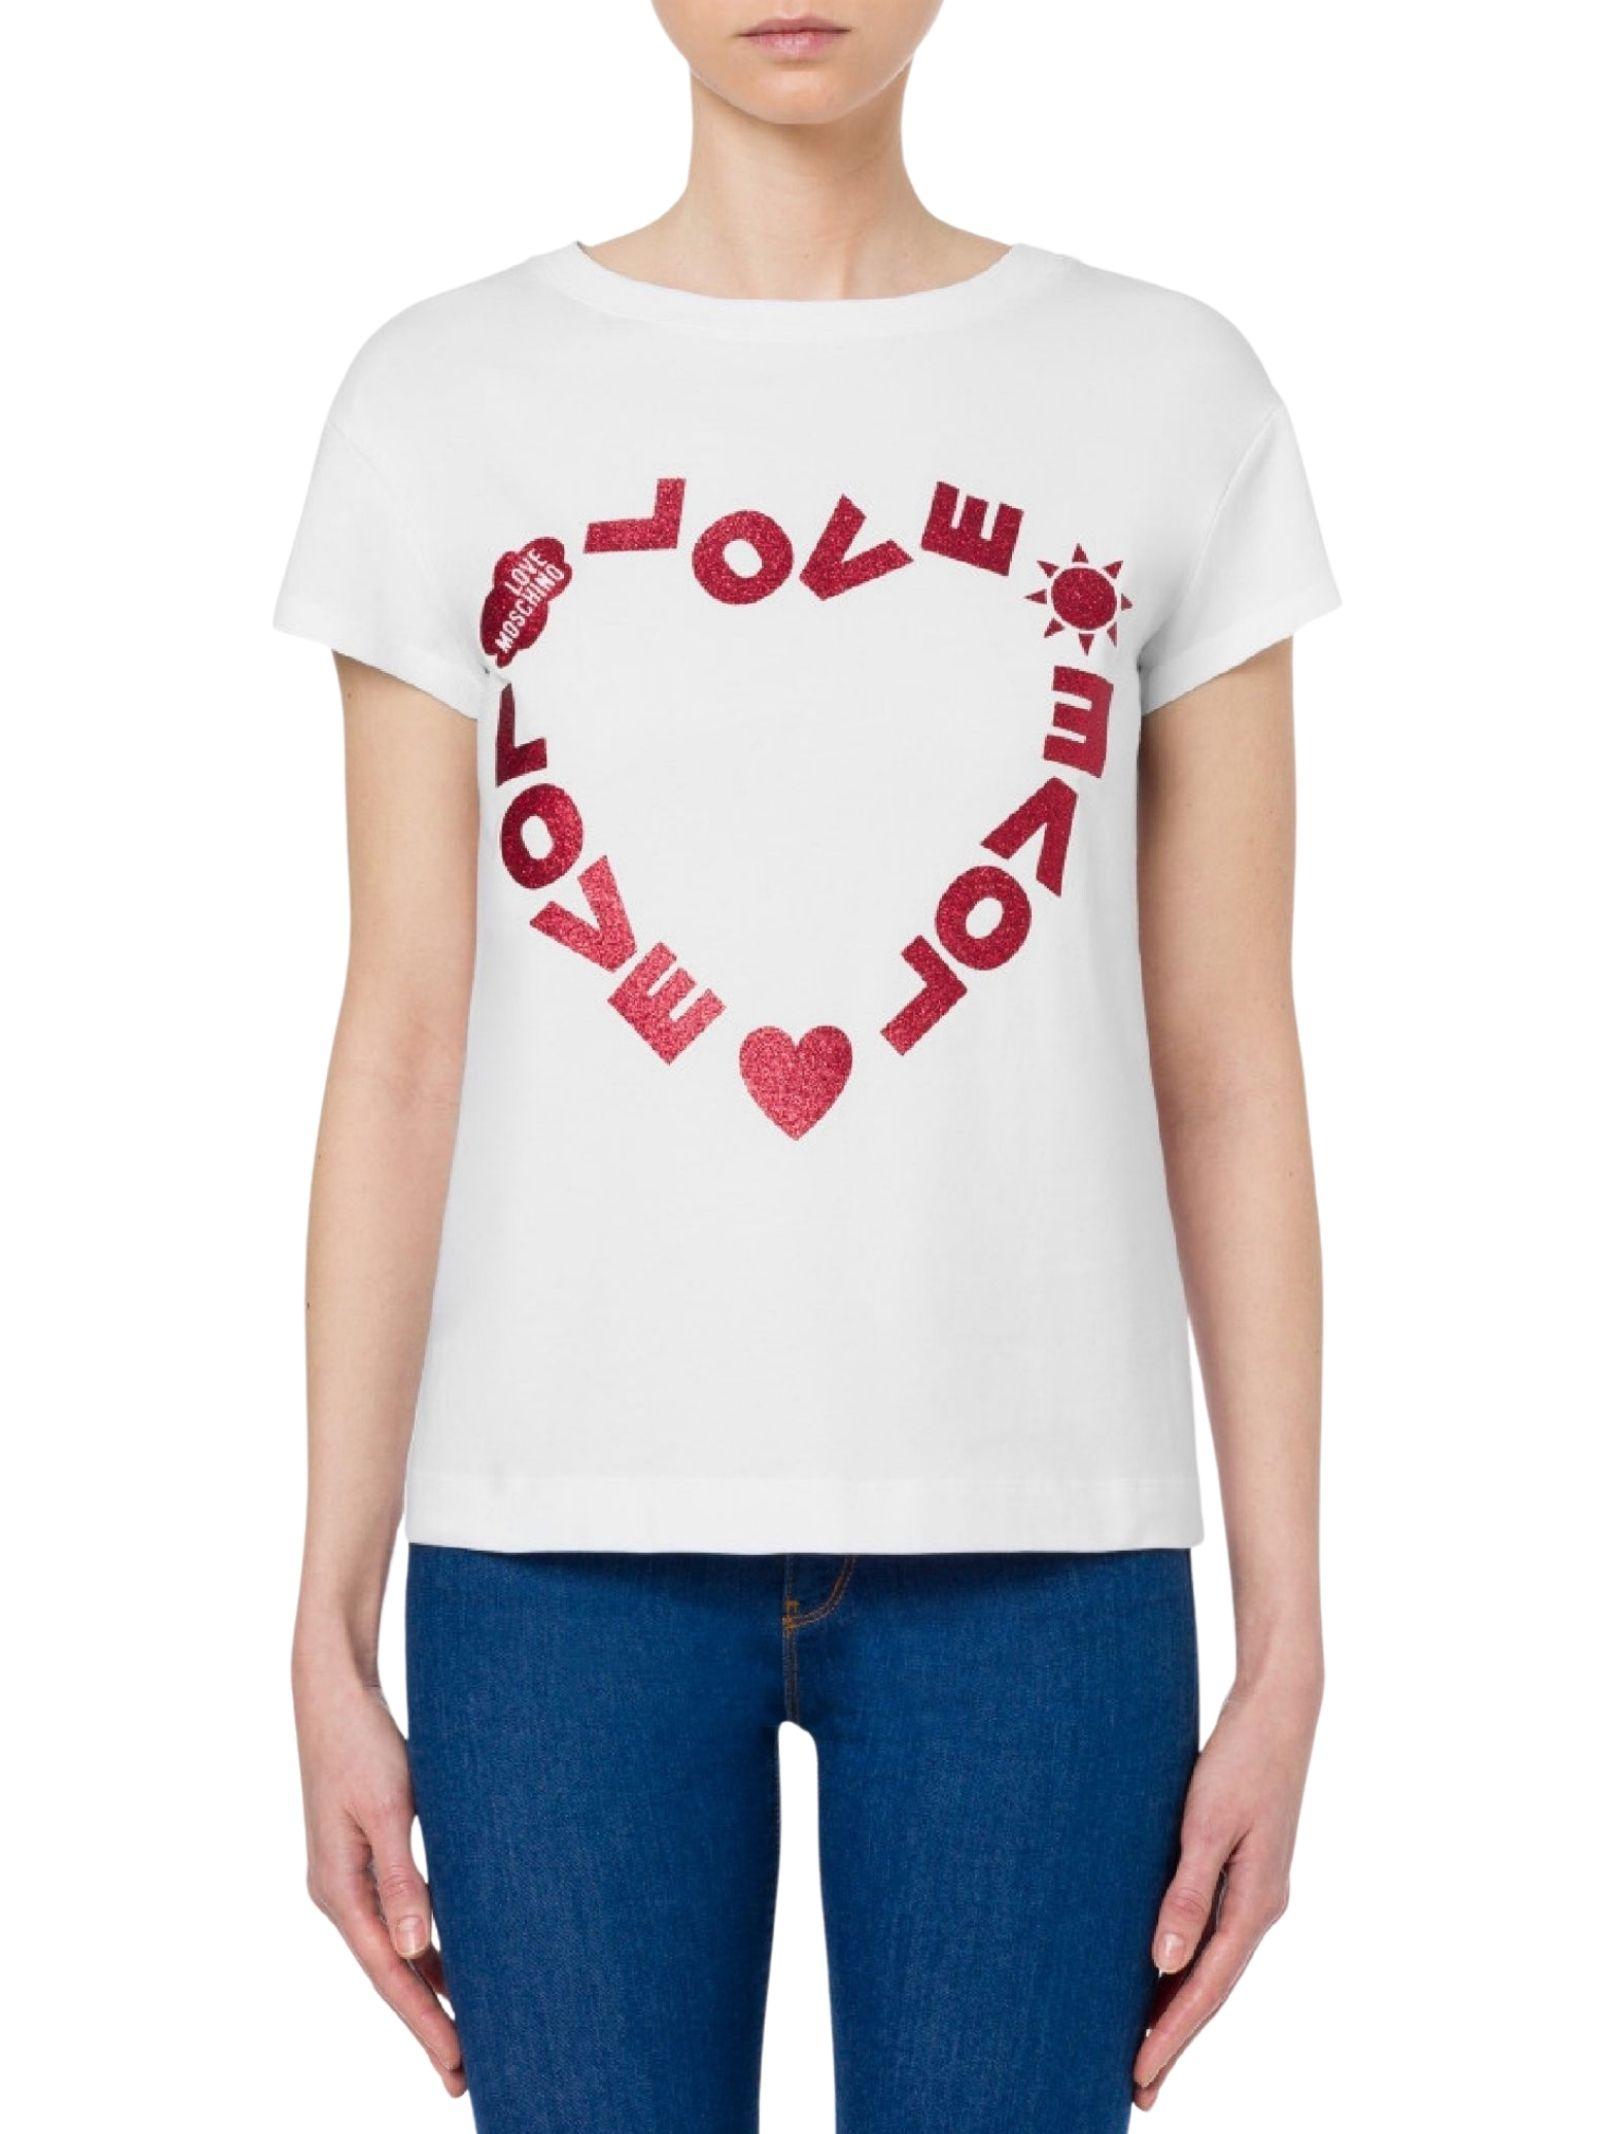 MOSCHINO LOVE | T-shirt | W 4 F30 2F E 1951A00